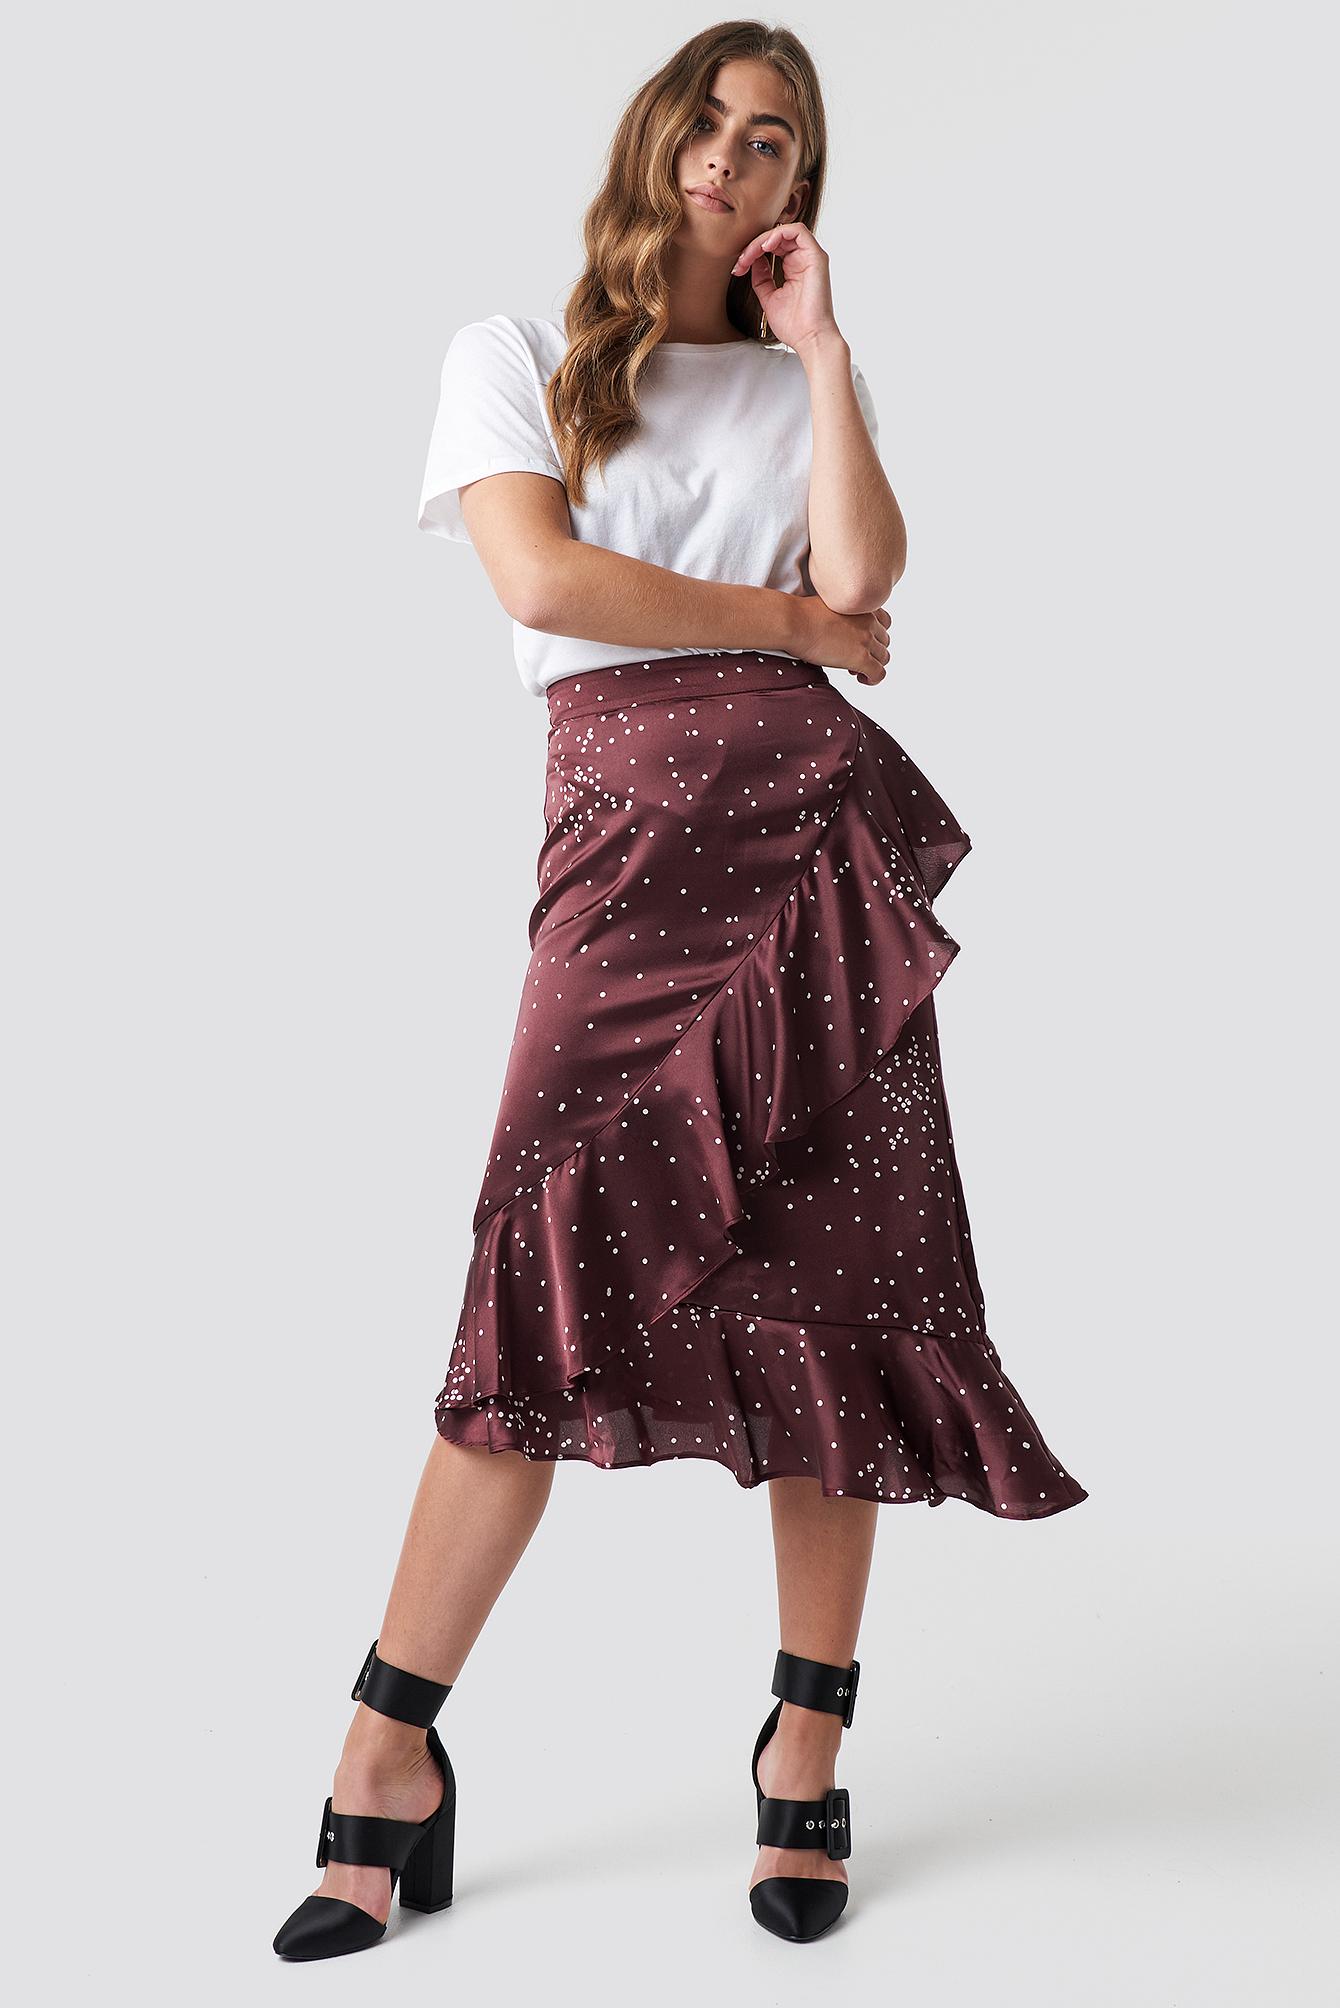 rut&circle -  Dotty Frill Skirt - Red